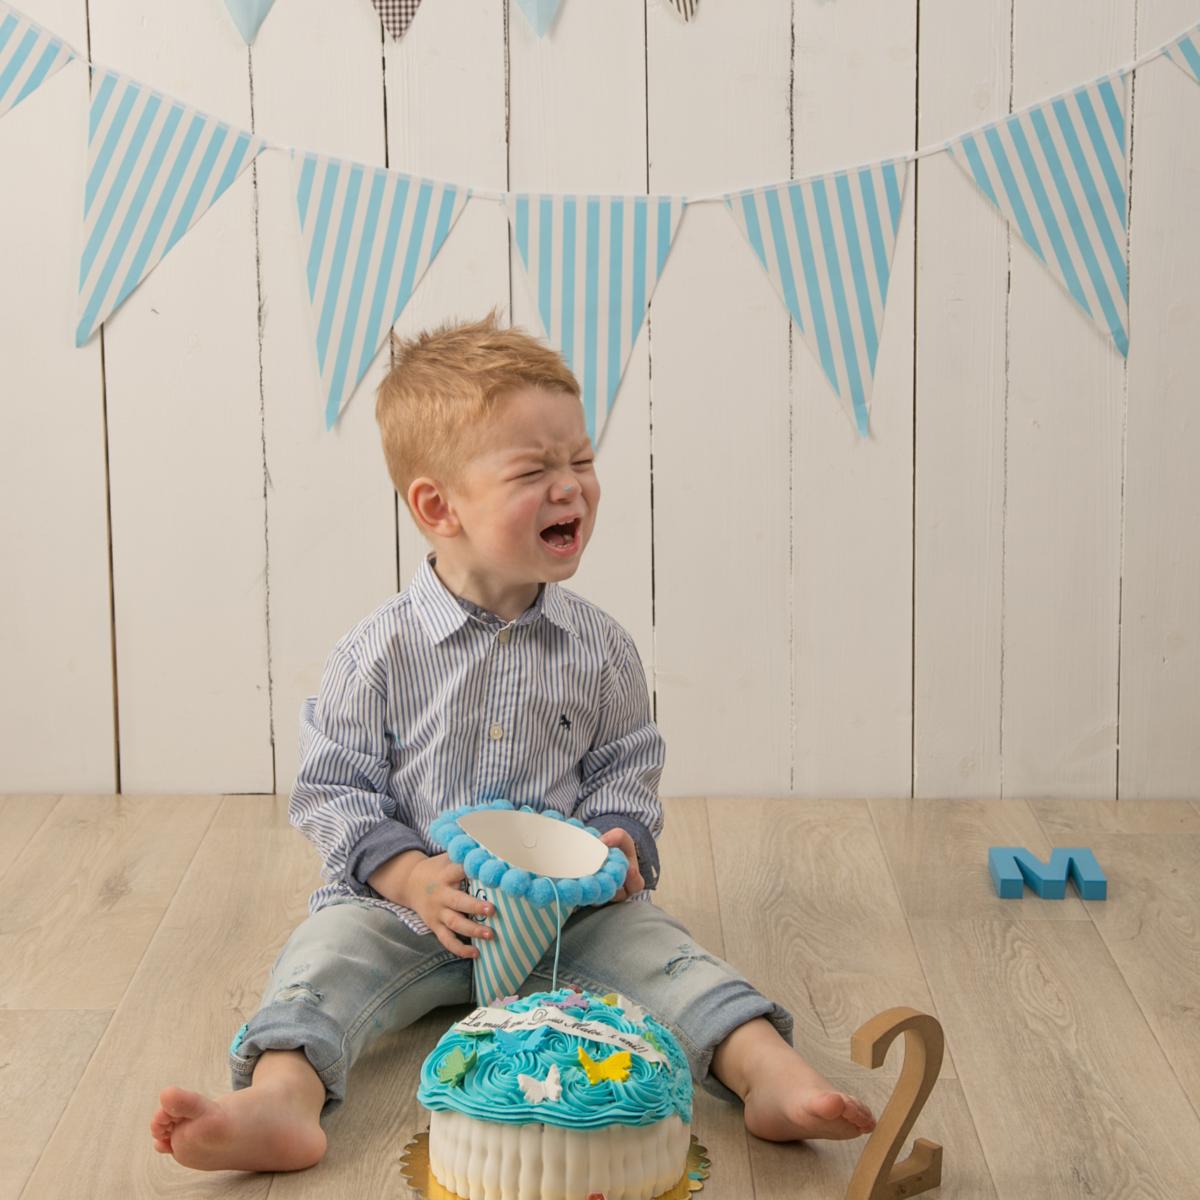 sedinta foto cu Bebe care plange langa tort